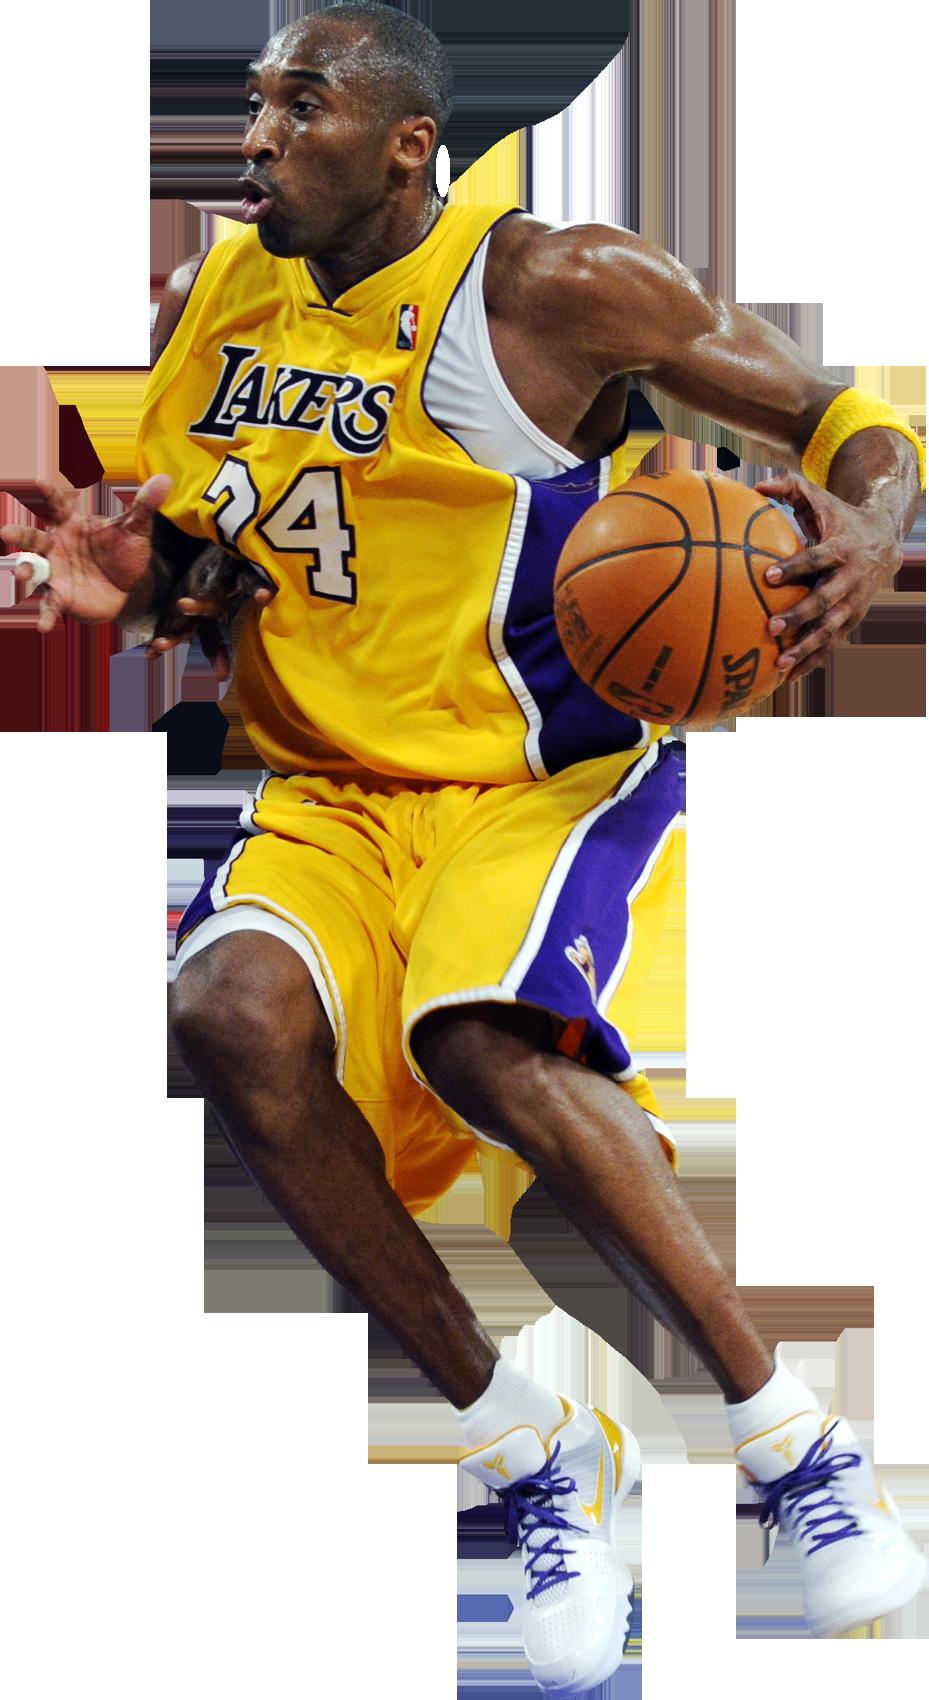 Sportz Insomnia Cut Gallery - Los Angeles Lakers